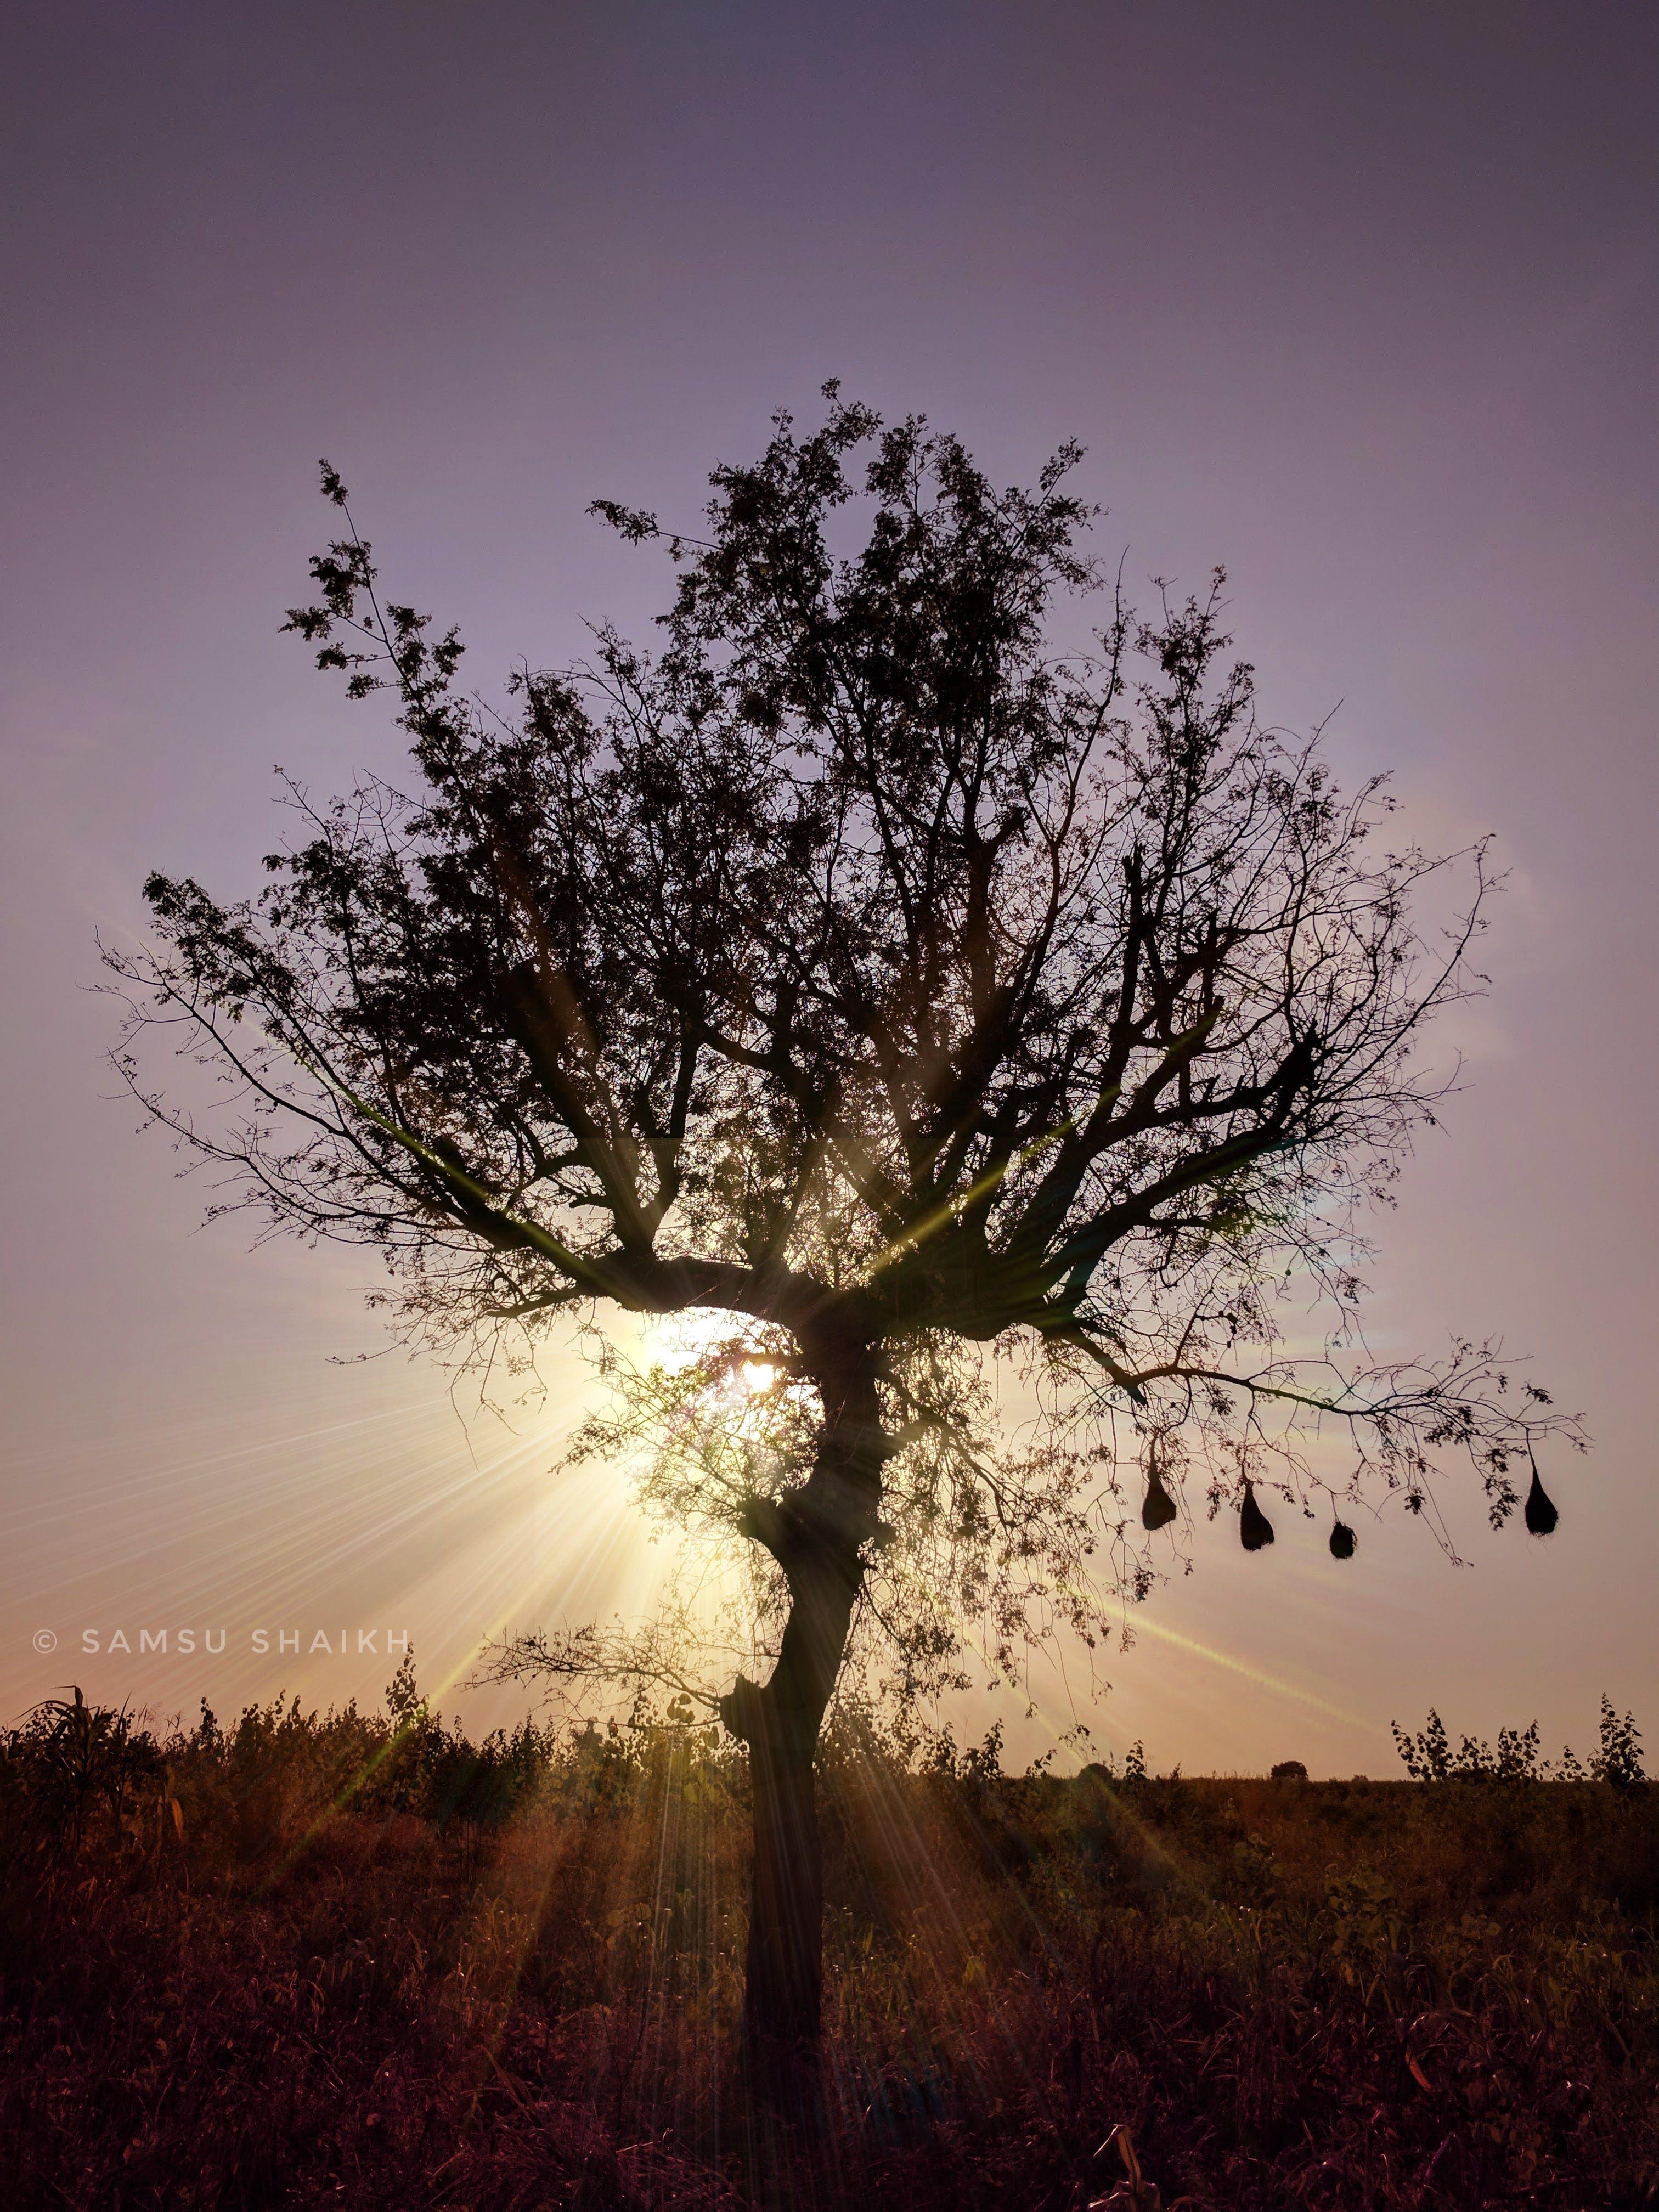 Free stock photo of #Tree, Adobe Photoshop, clear sky, farm